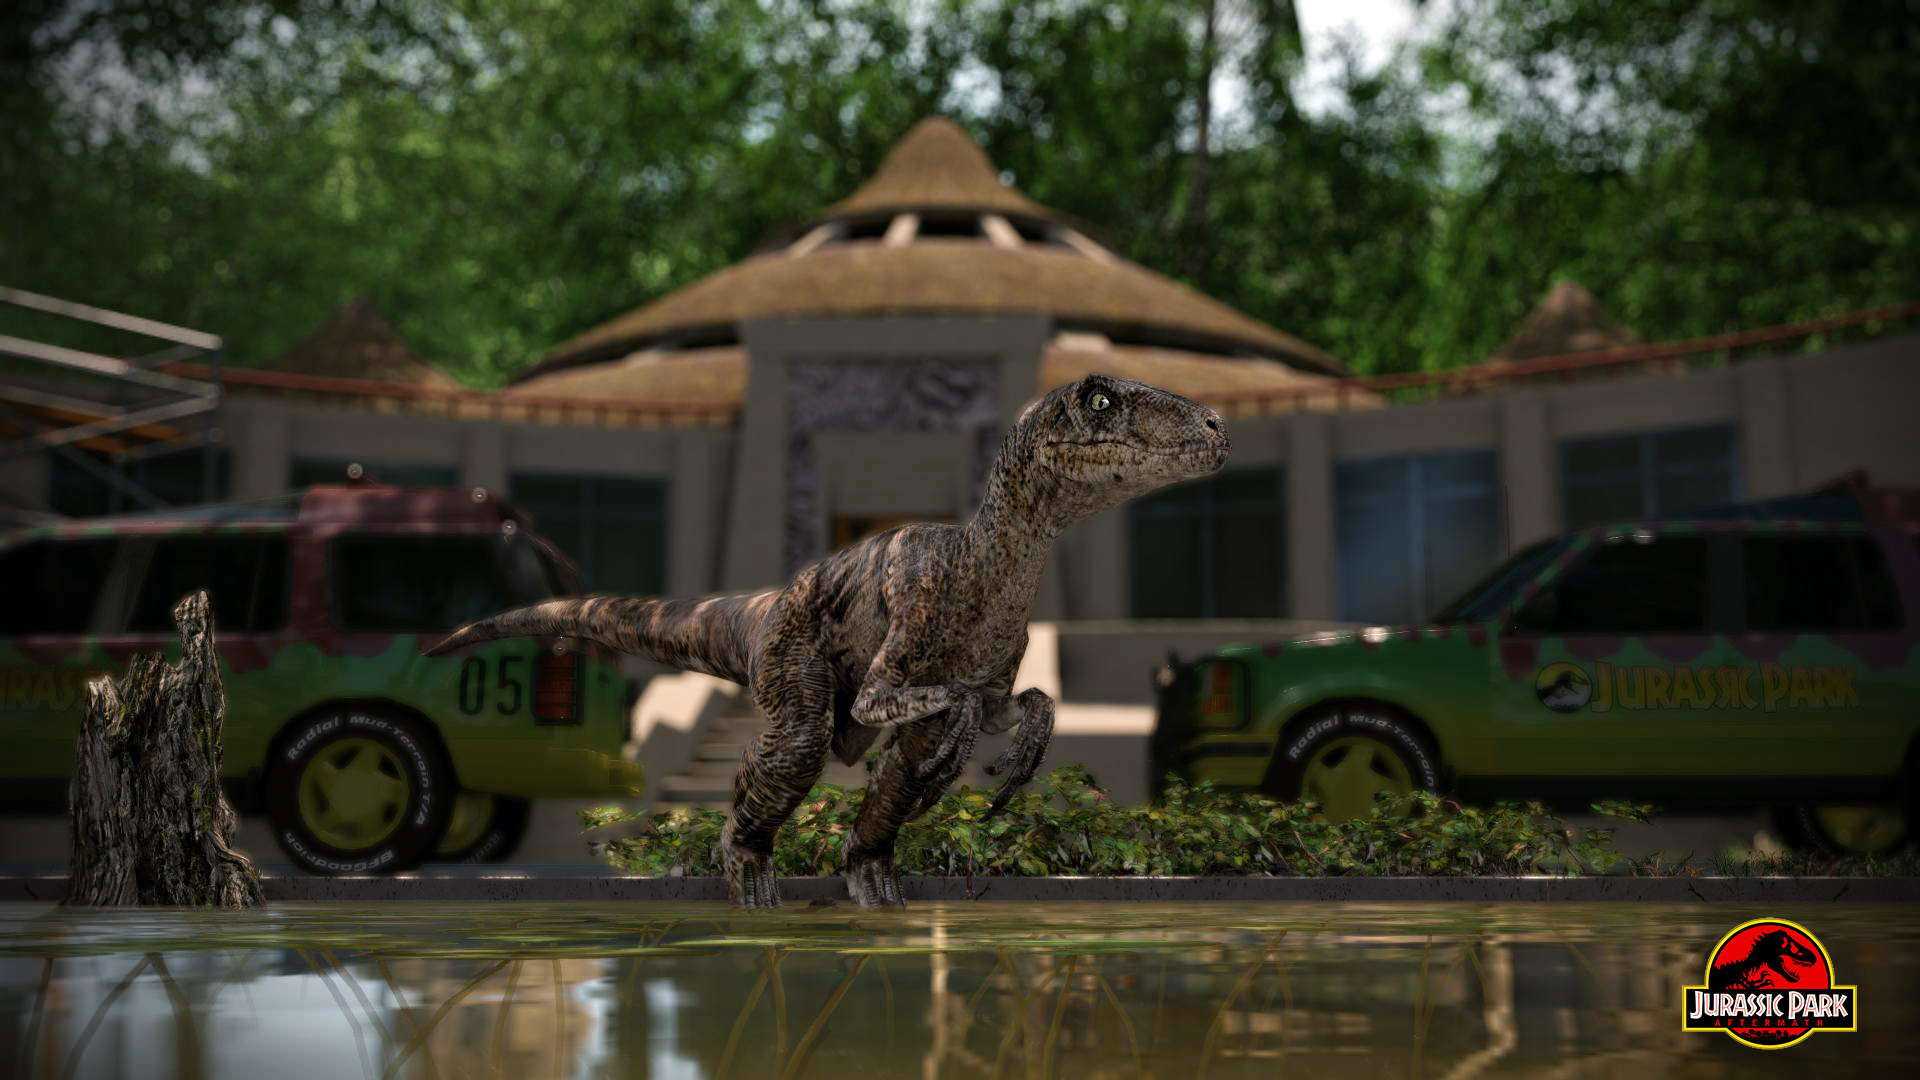 Jurassic park Aftermath by metonymic on DeviantArt – Gmod Jurassic World Map